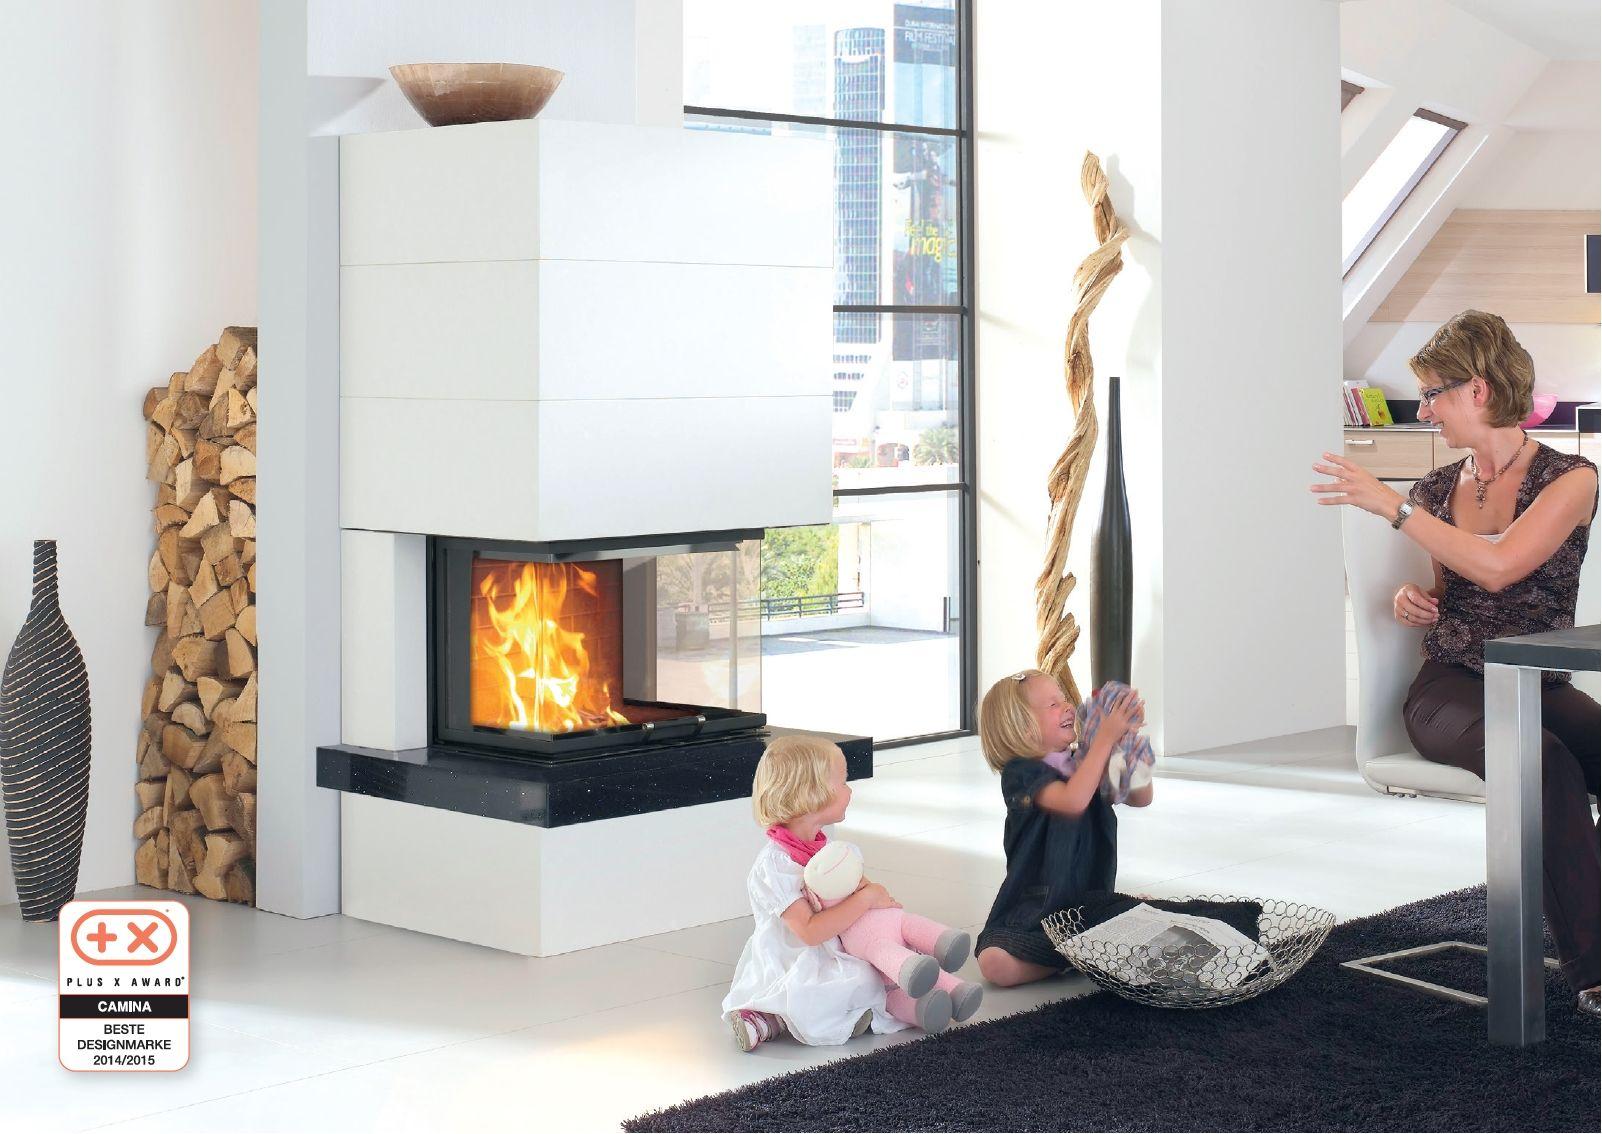 kamin ohne abzug best bio ethanol brenner afire with kamin ohne abzug free with kamin ohne. Black Bedroom Furniture Sets. Home Design Ideas